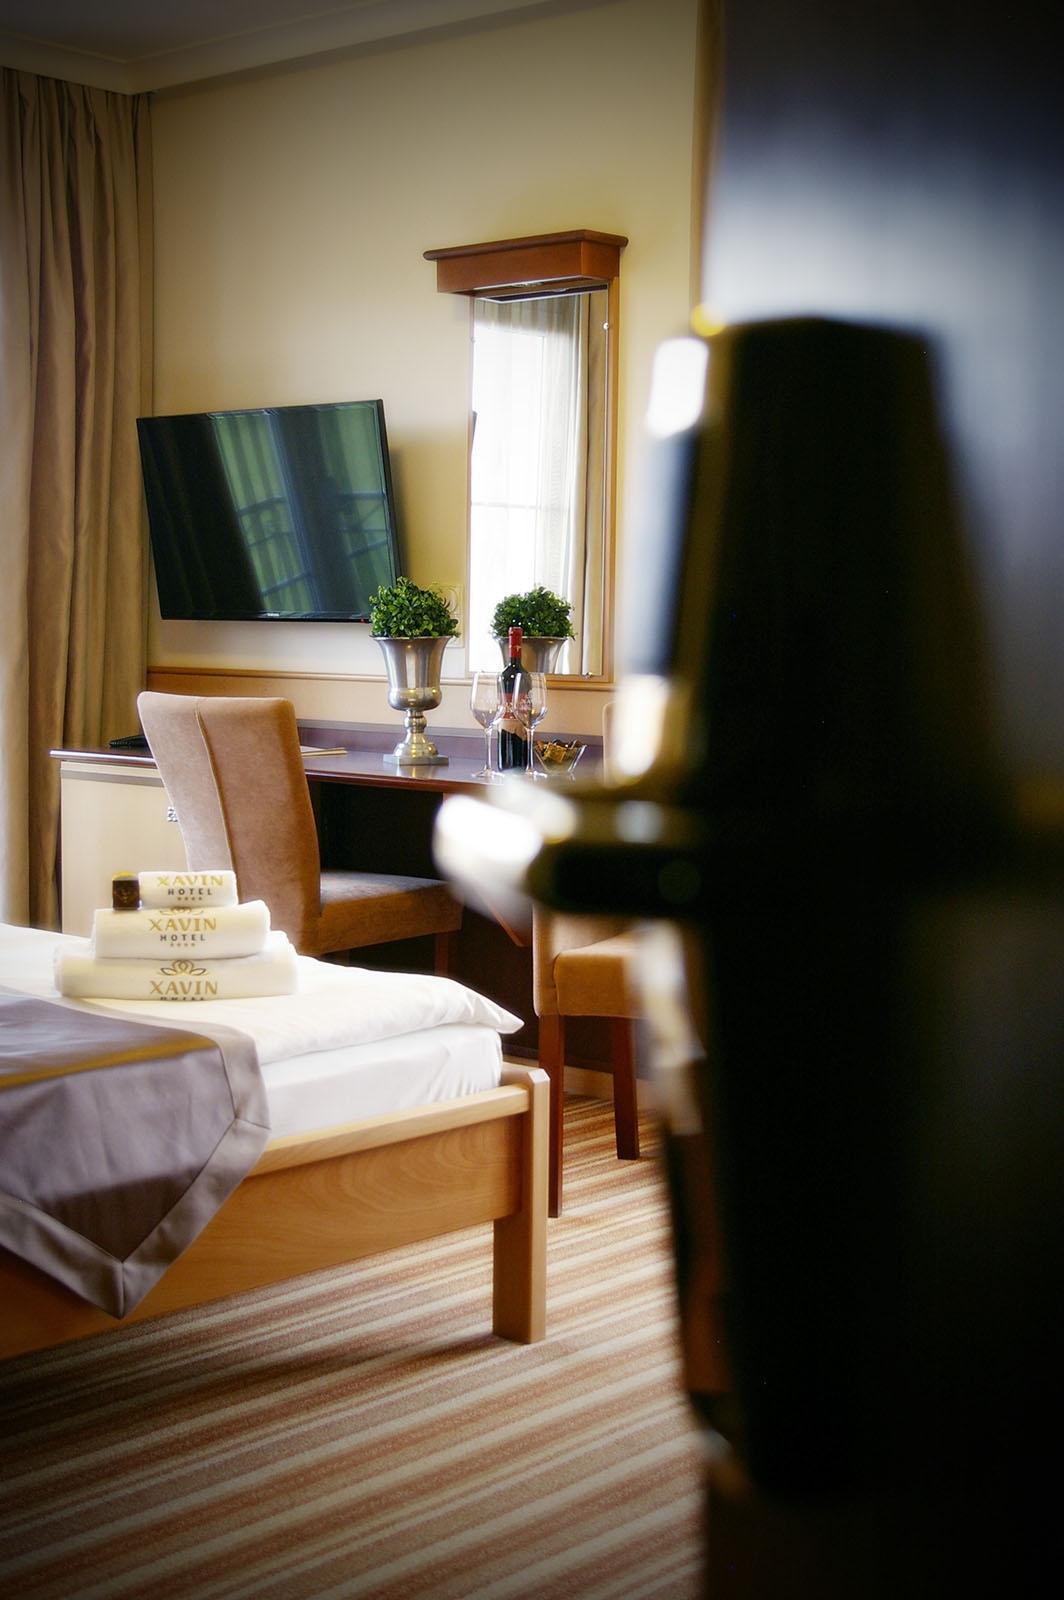 spa-wellness/banja-harkanj/hotel-xavin/xavin-hotel-soba.JPG